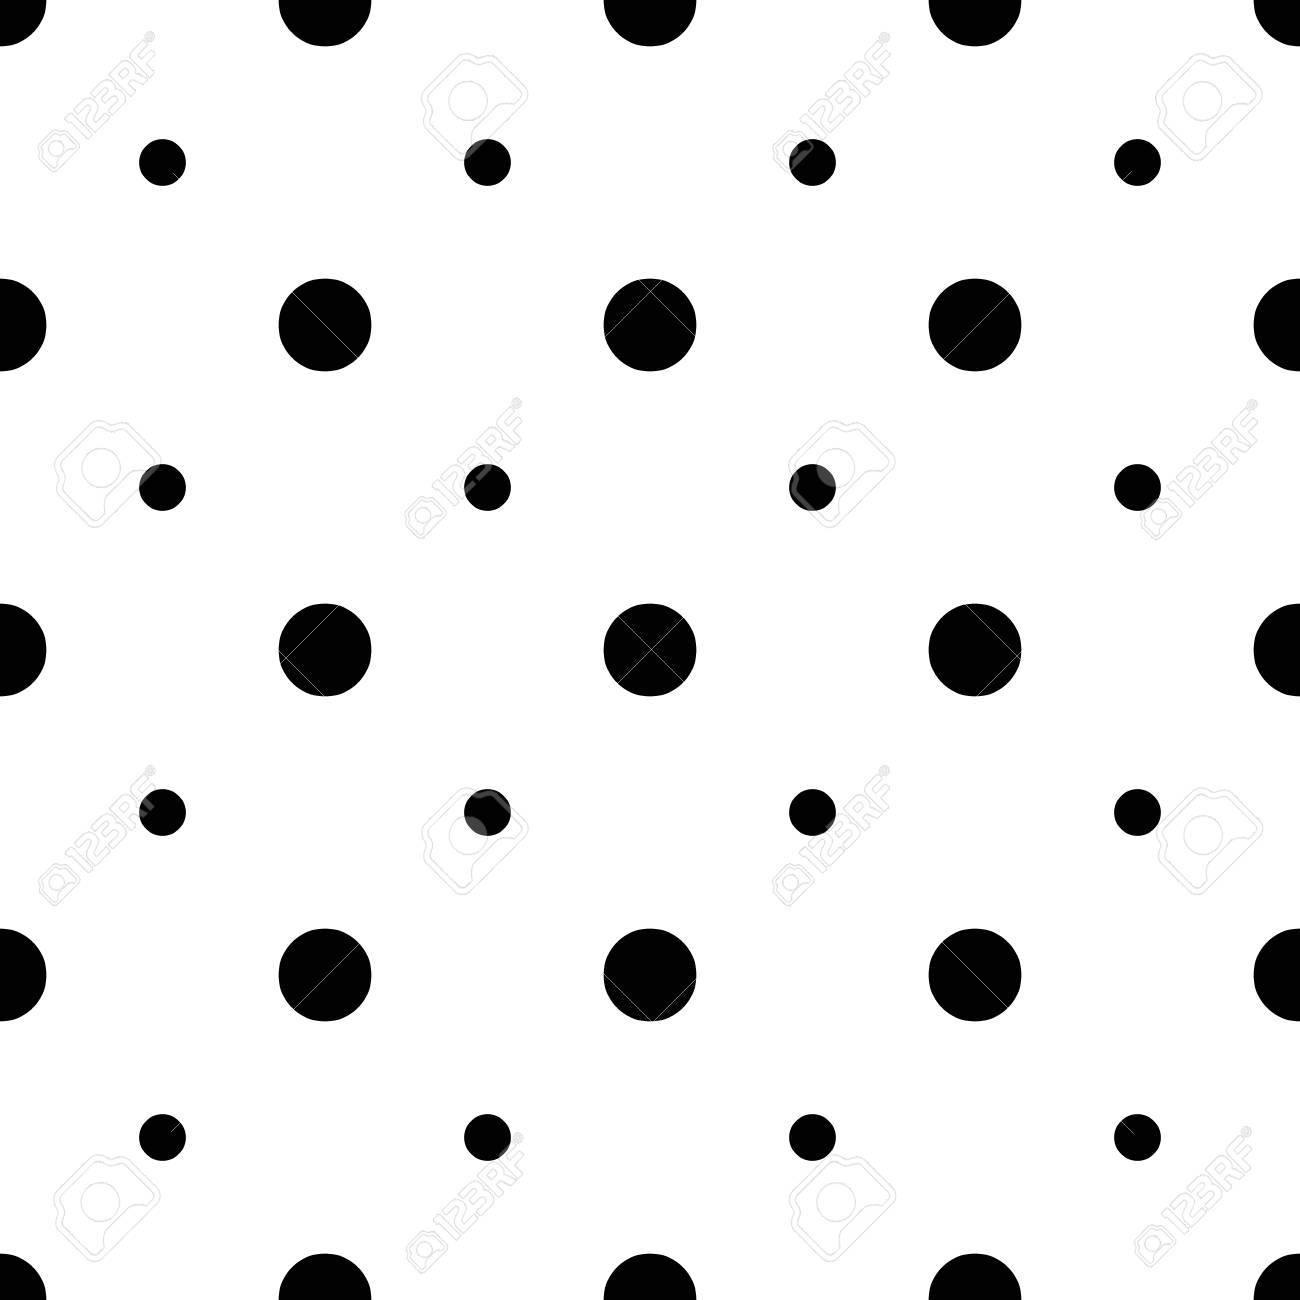 Unusual Big And Small Polka Dot Seamless Pattern Square Arrangement